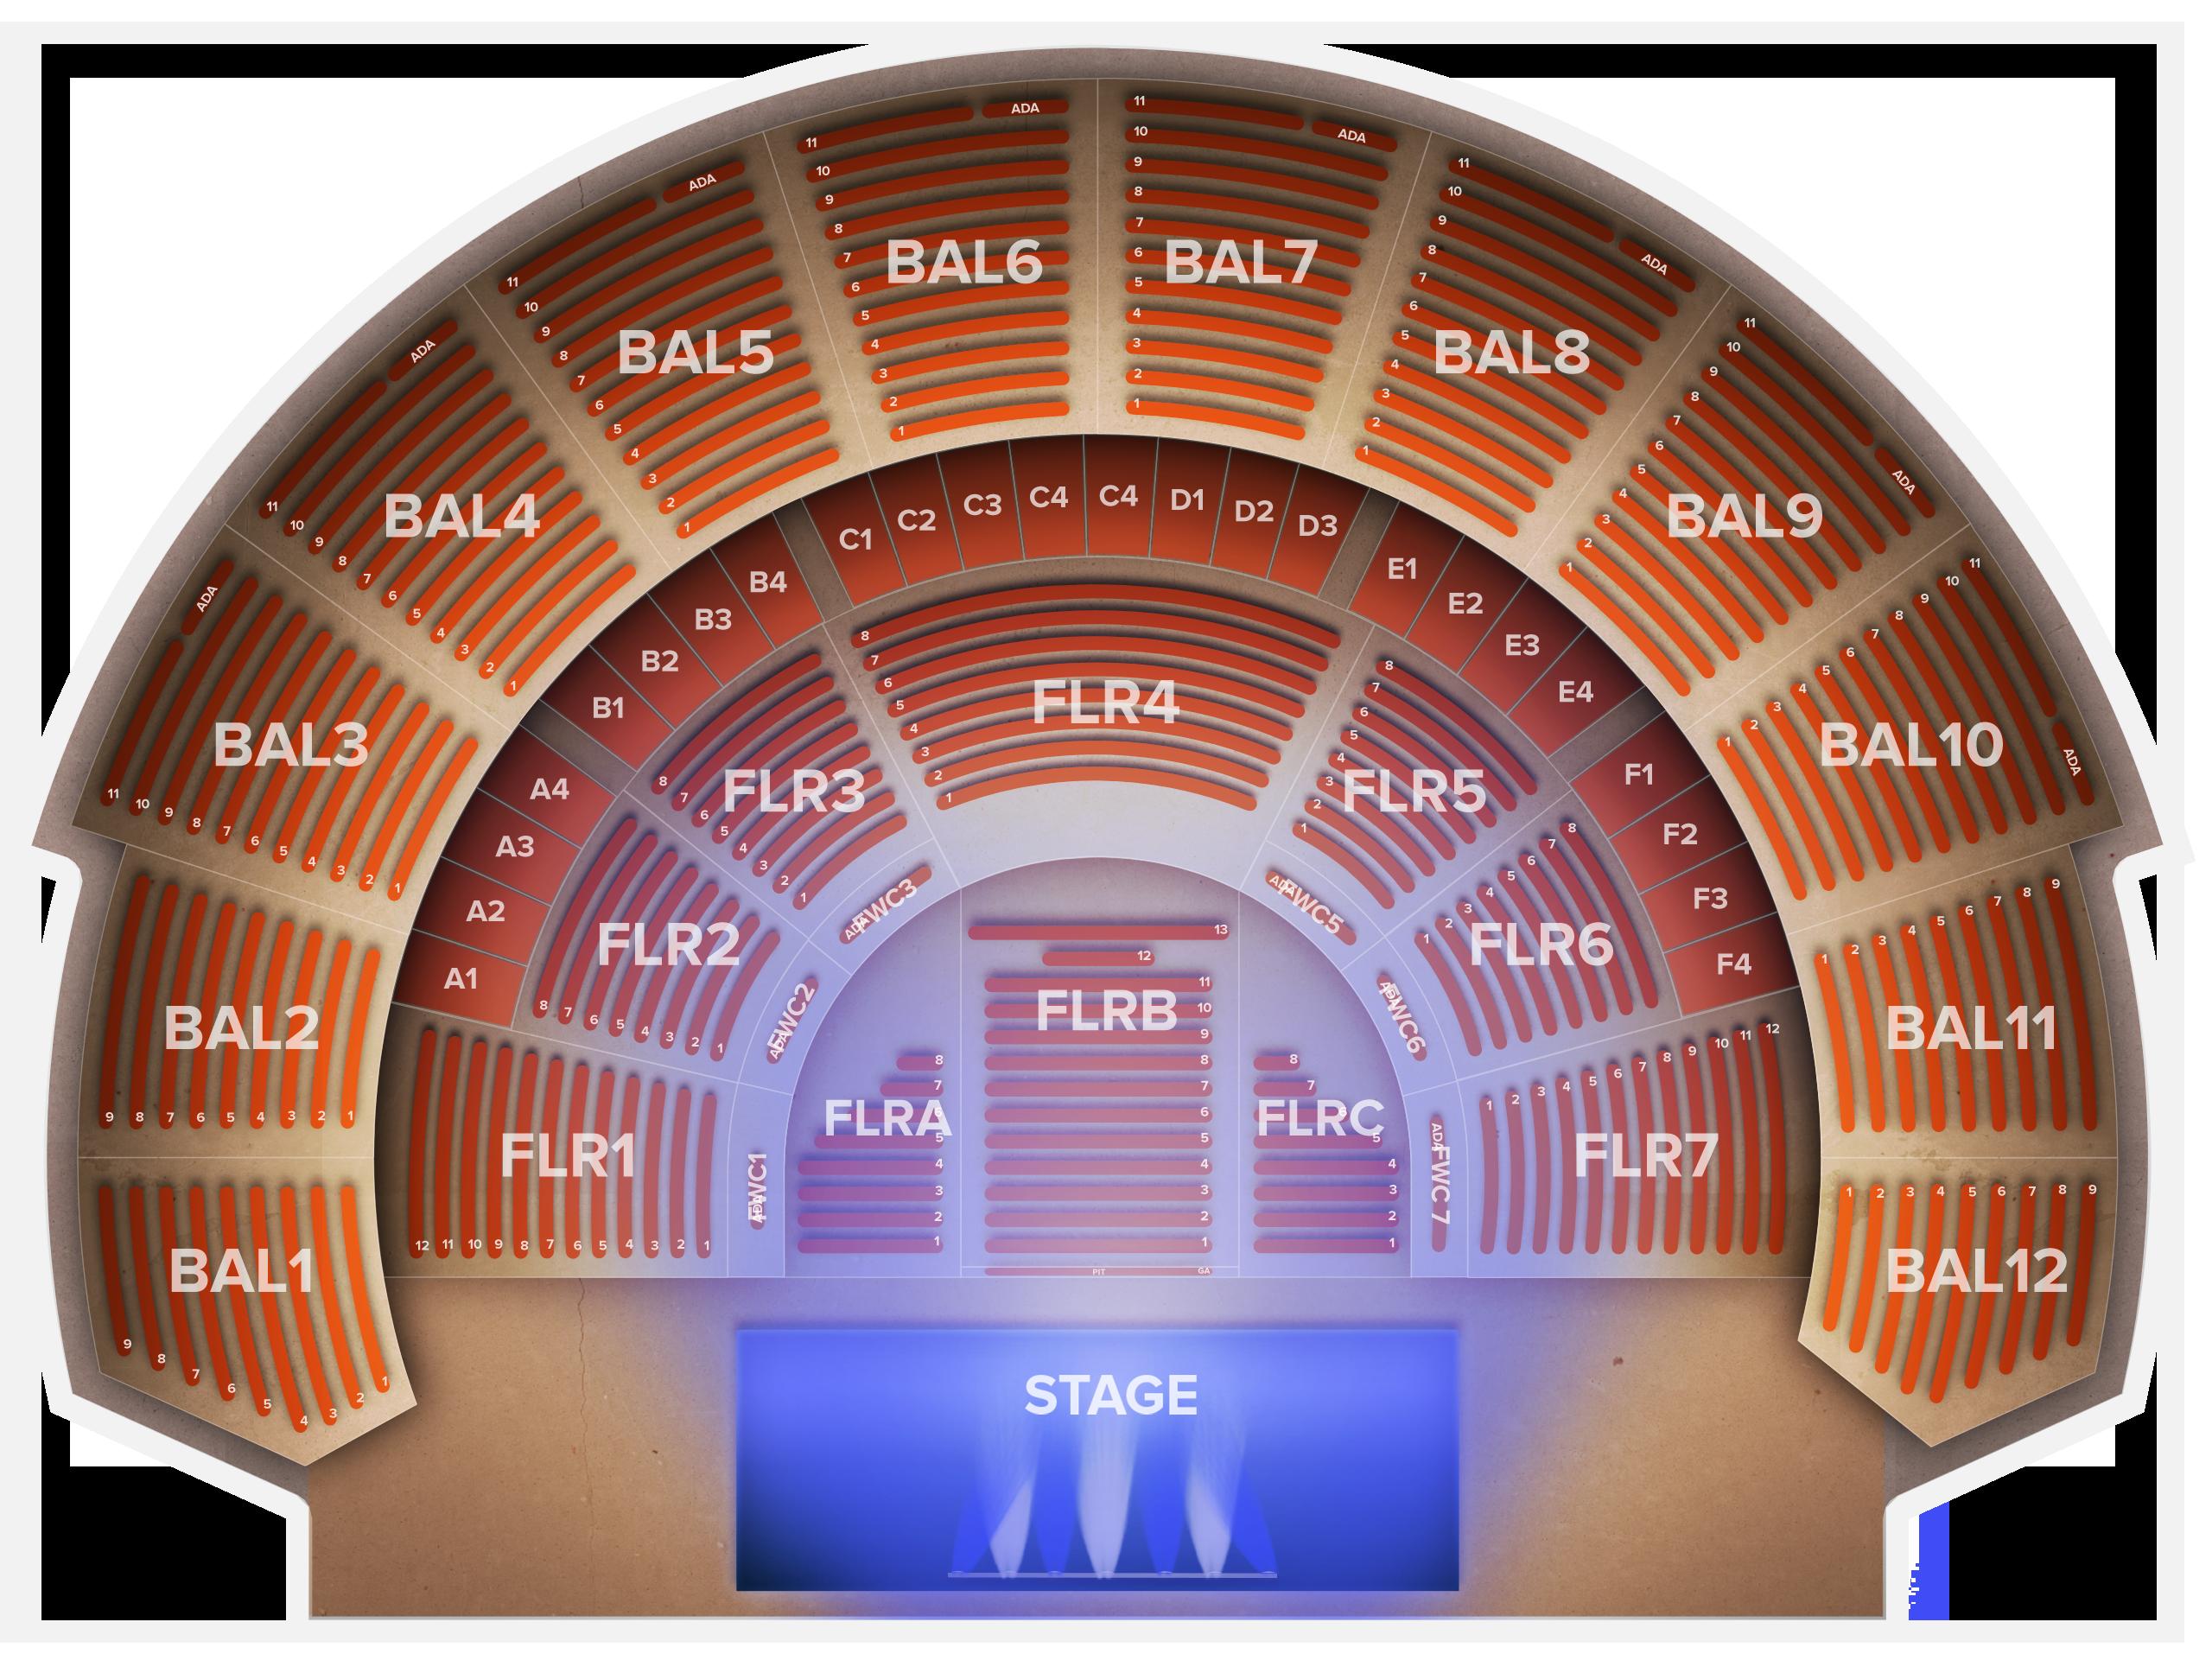 The Masonic Tickets